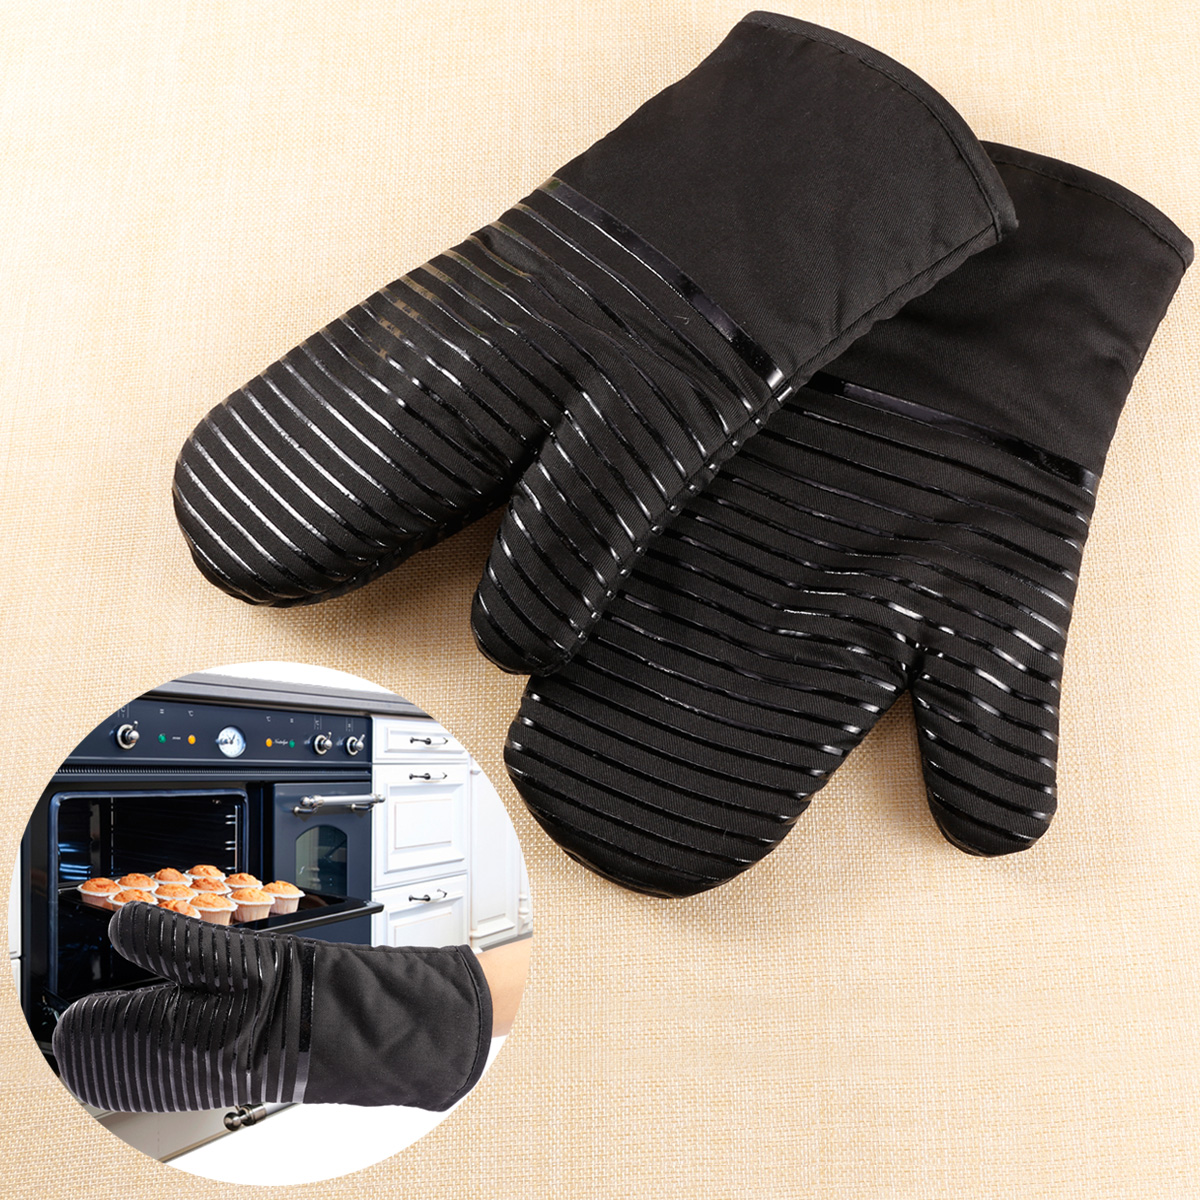 schwarz silikon topfhandschuhe ofenhandschuhe grillhandschuhe backen 6 ebay. Black Bedroom Furniture Sets. Home Design Ideas